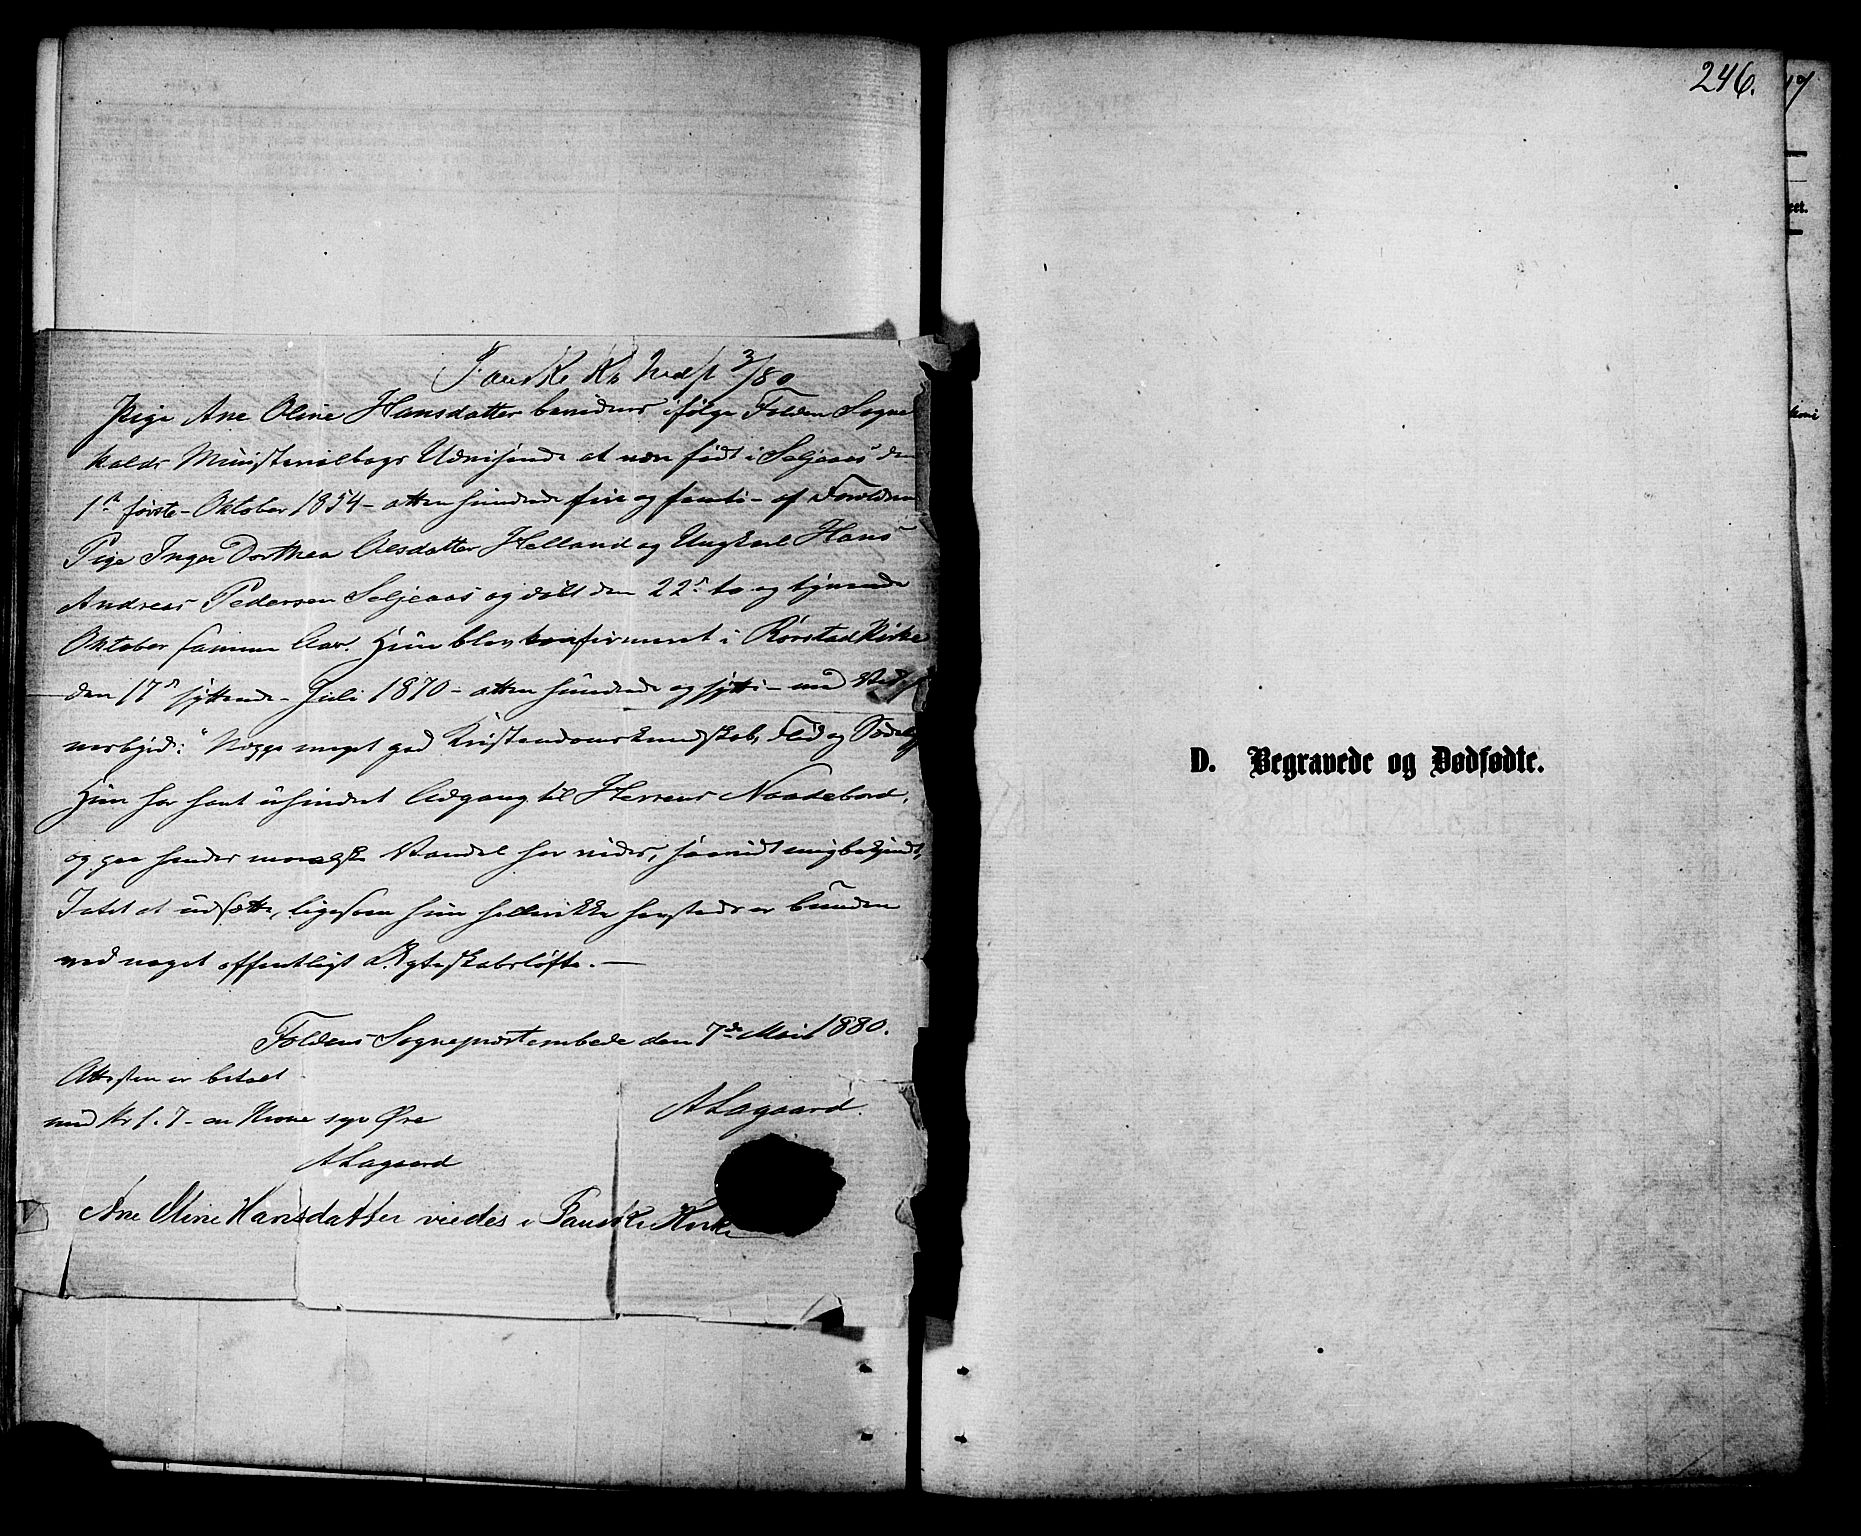 SAT, Ministerialprotokoller, klokkerbøker og fødselsregistre - Nordland, 853/L0771: Ministerialbok nr. 853A10, 1870-1881, s. 246